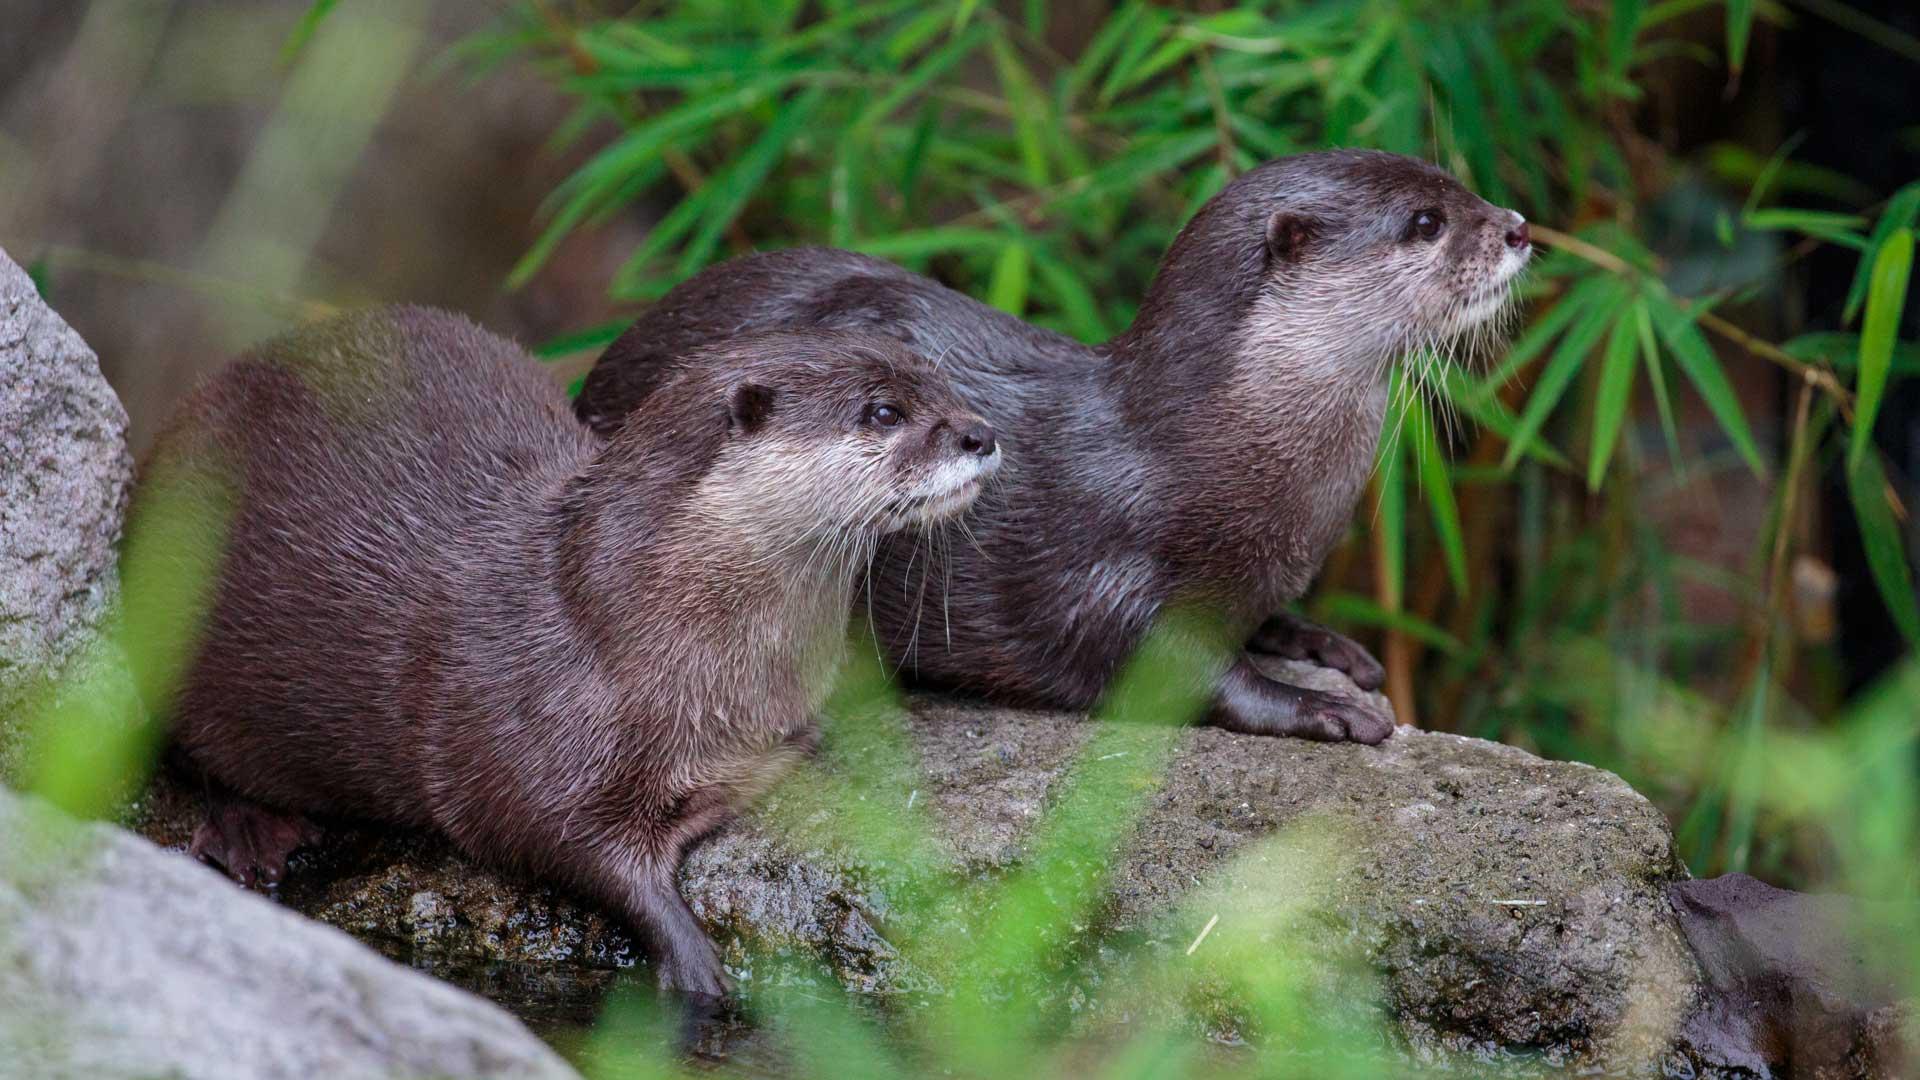 https://rfacdn.nz/zoo/assets/media/otter-gallery-3.jpg